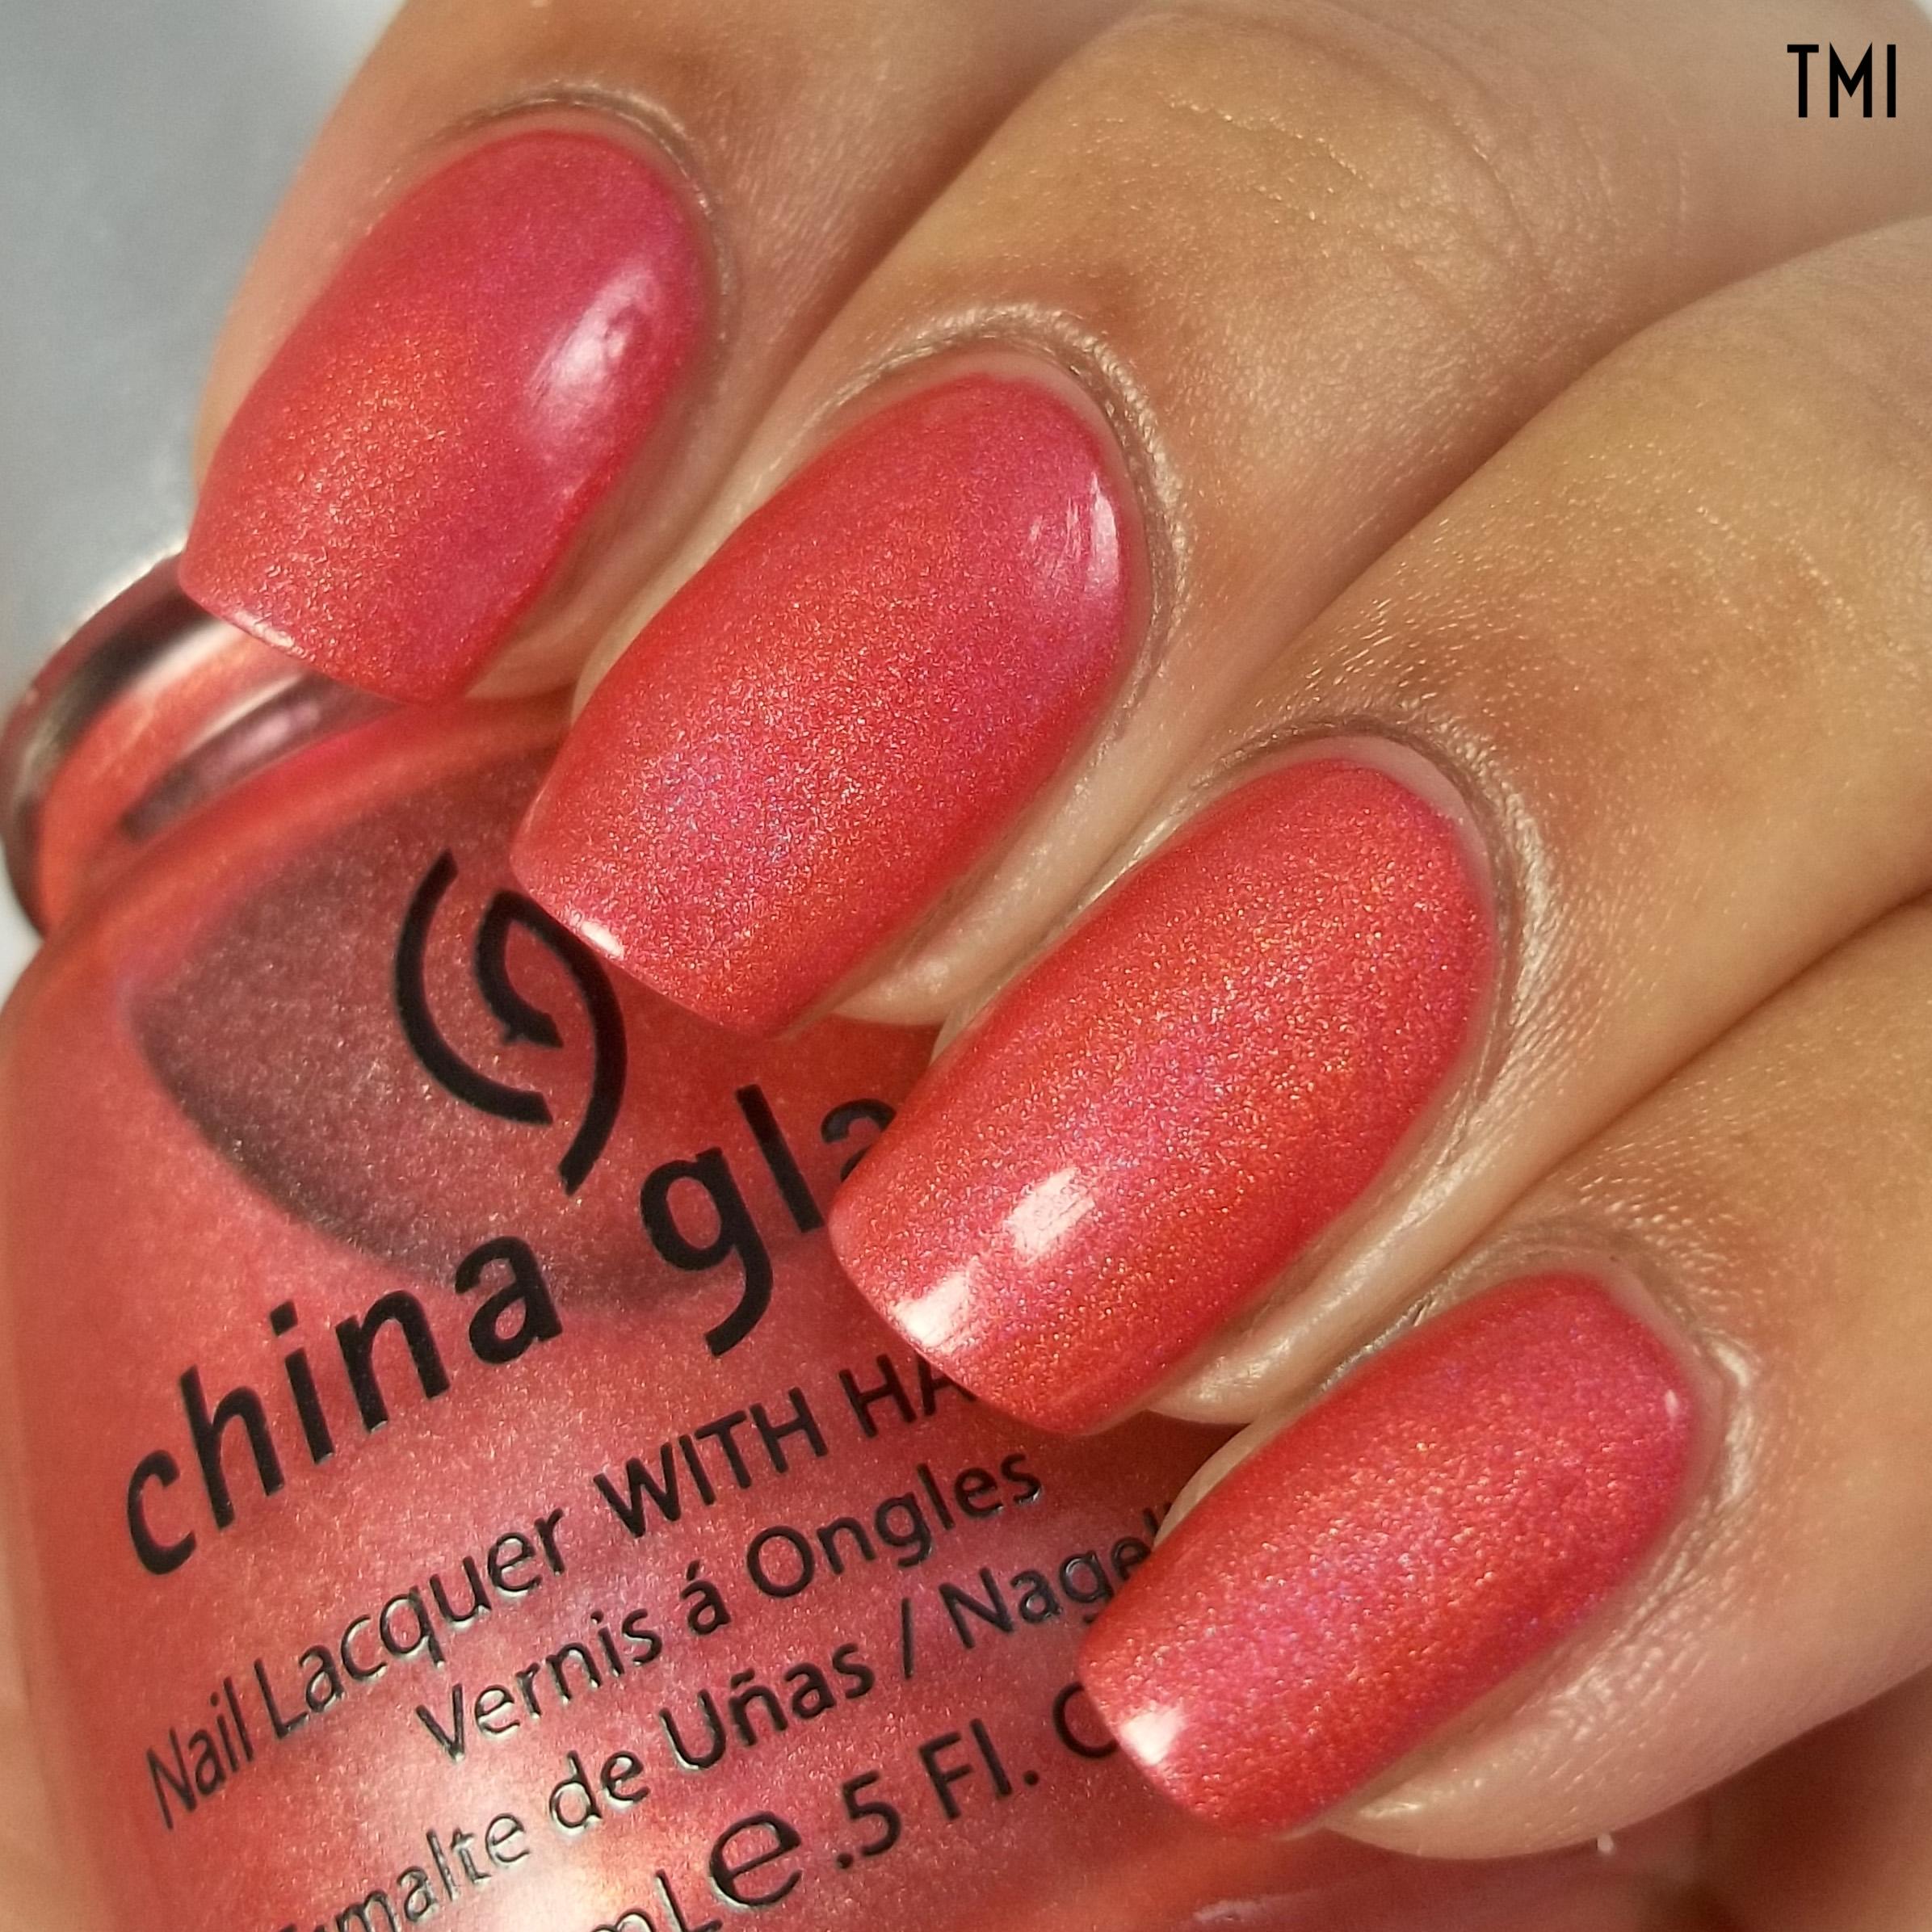 China Glaze OMG - TMI.jpg